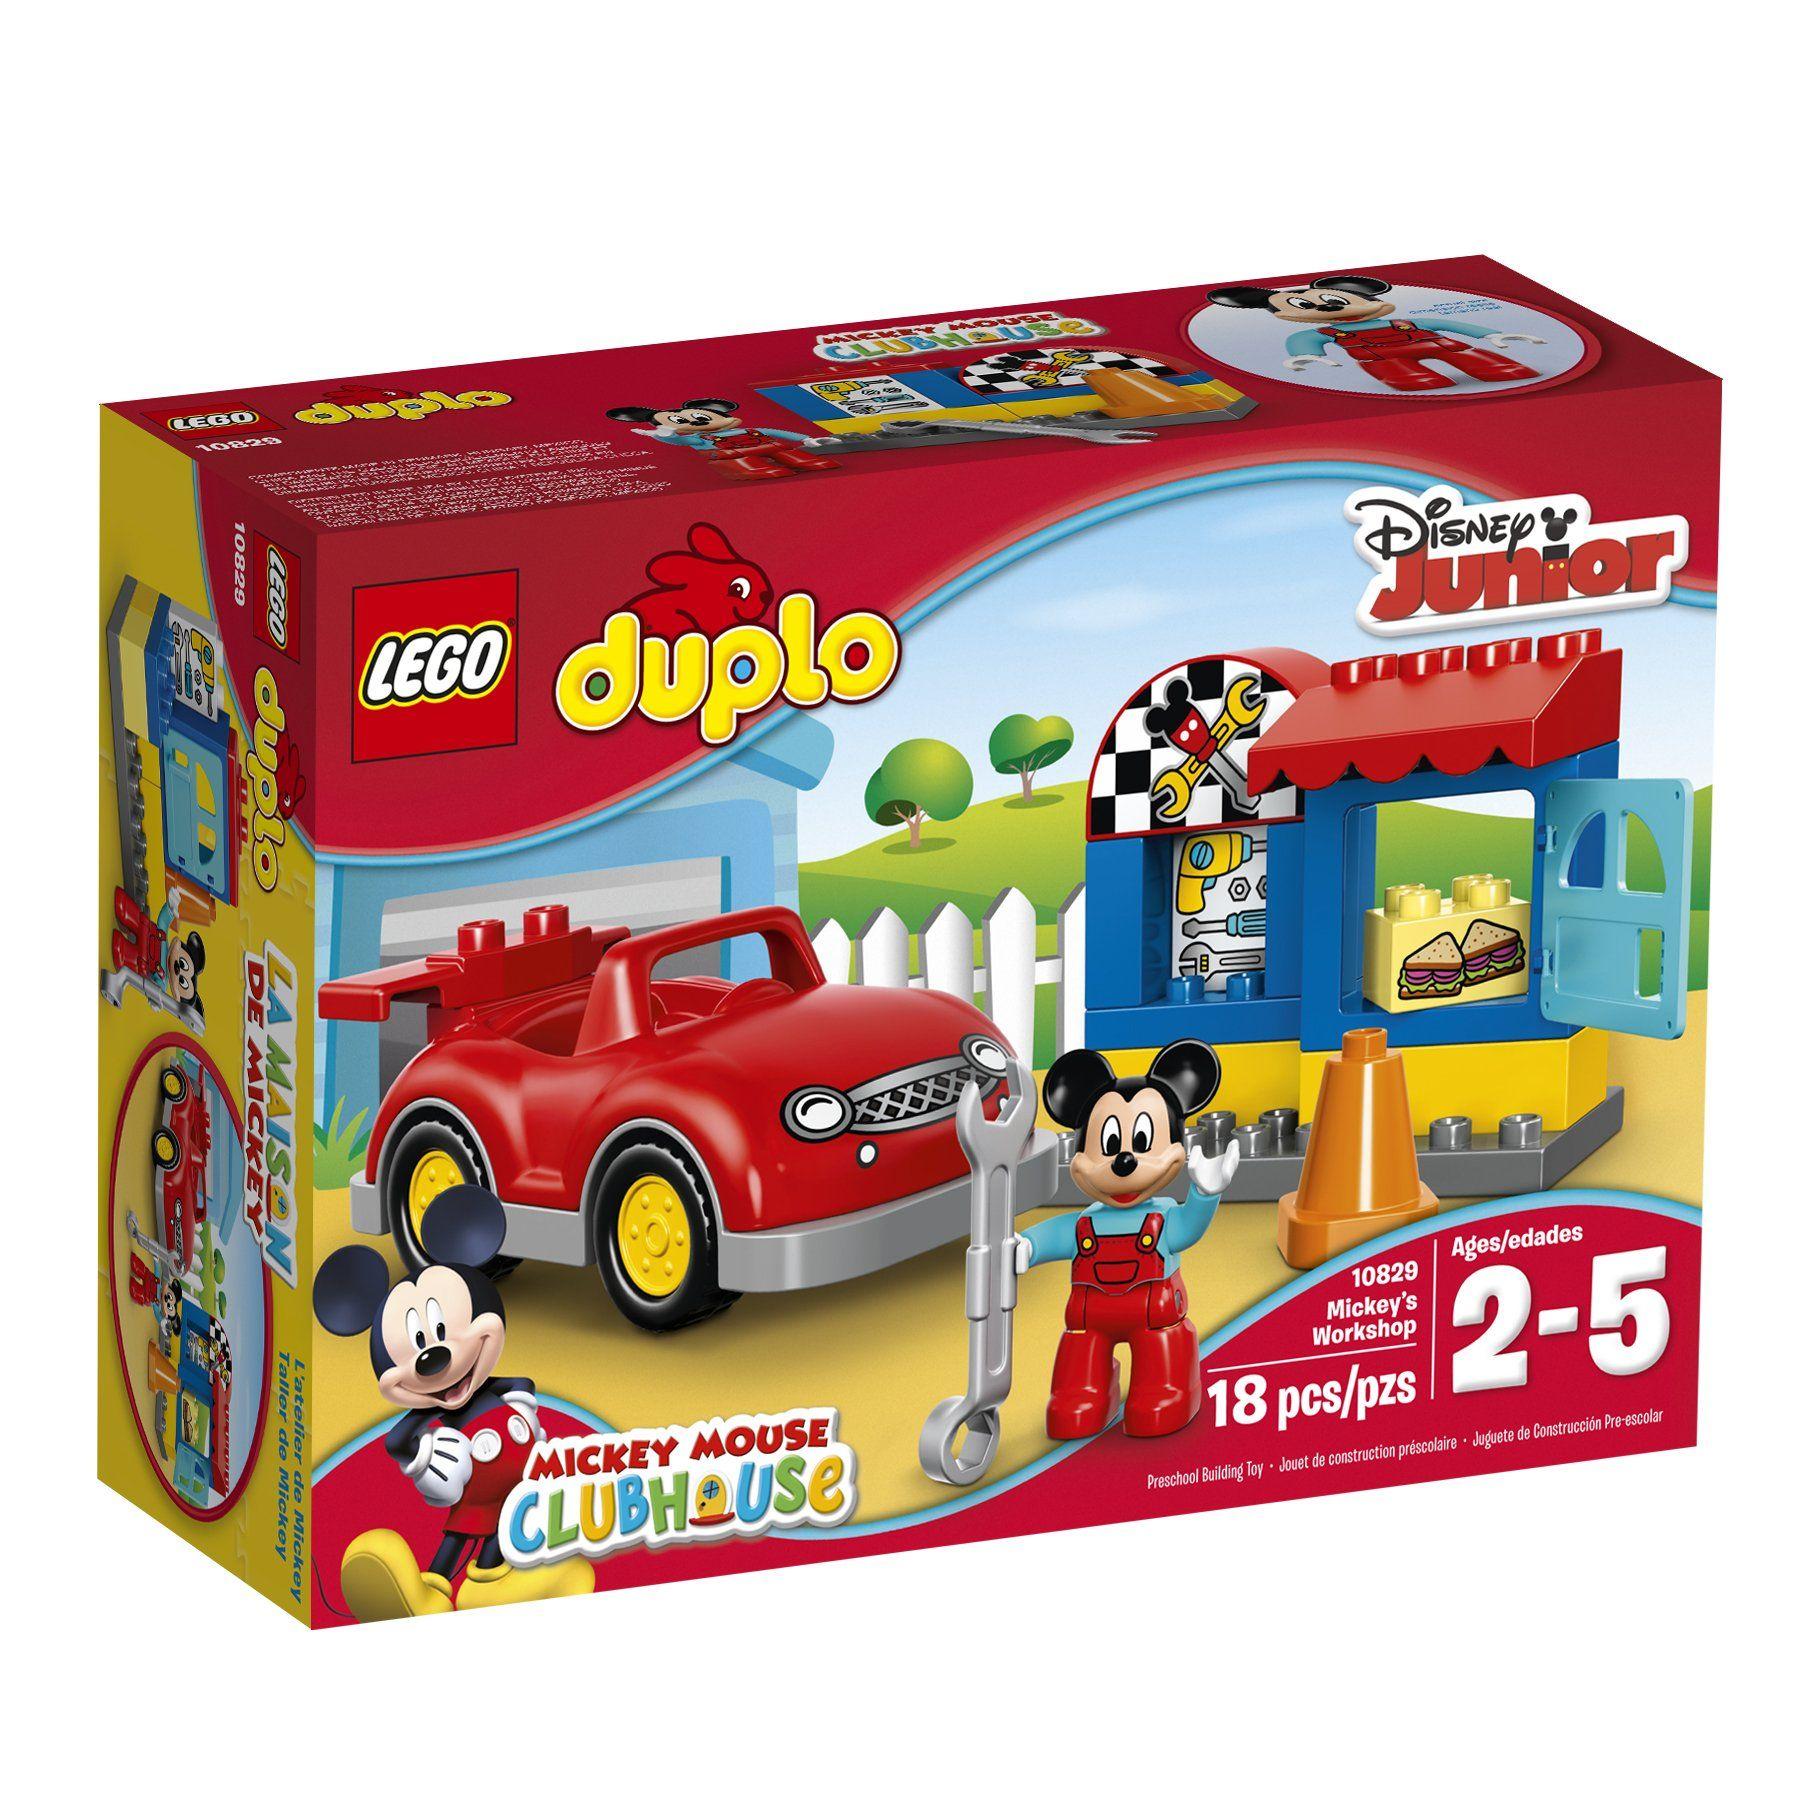 Robot Check Lego Duplo Christmas Toys Mickey Mouse